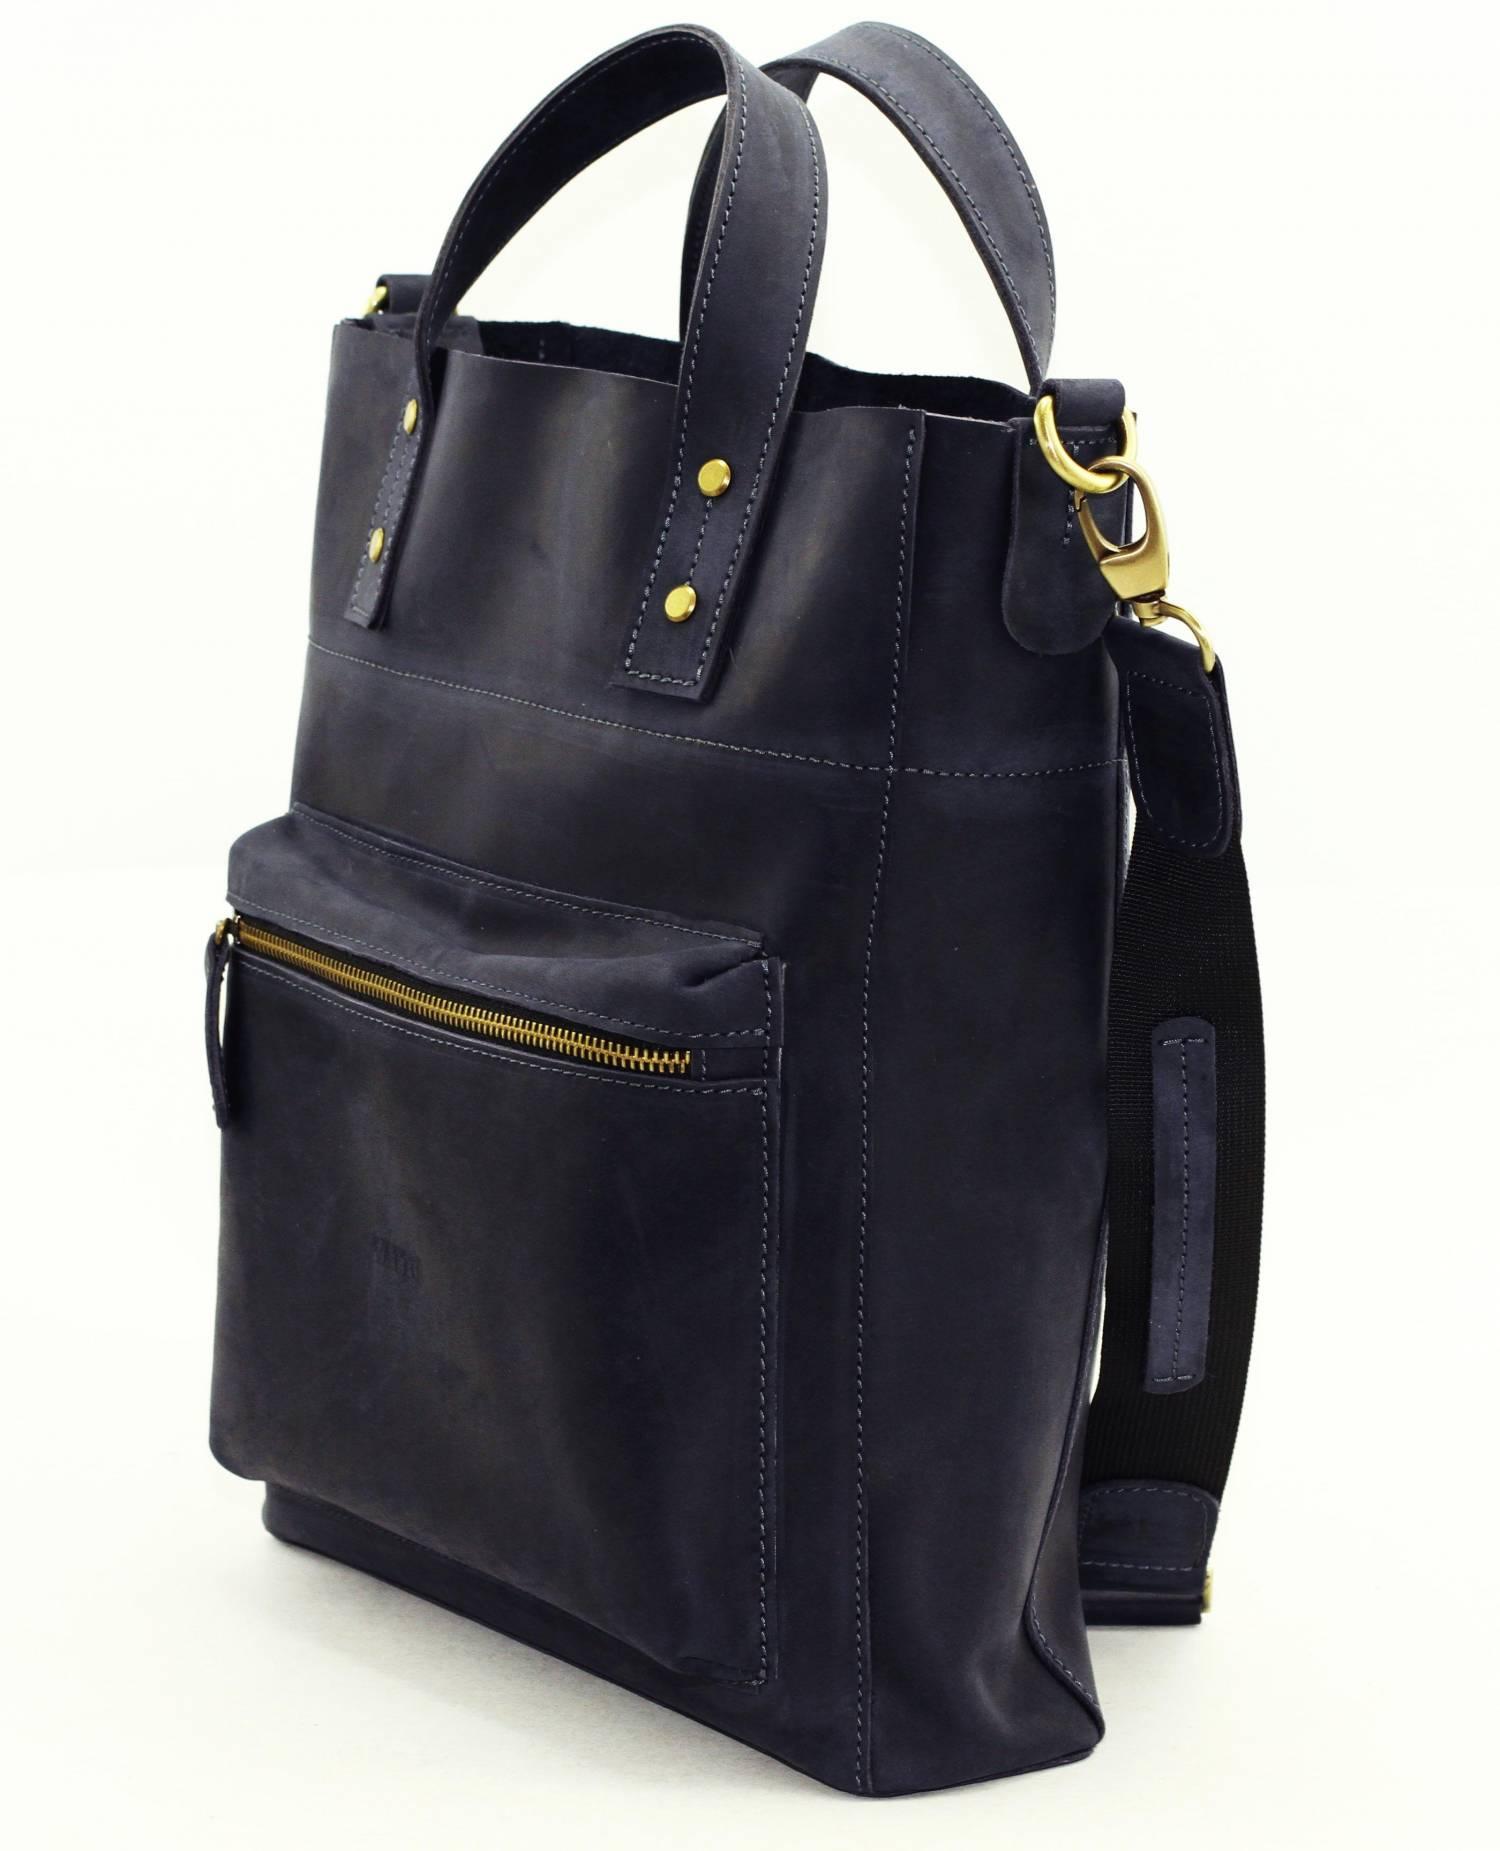 ae8a9e32a329 Мужская сумка VATTO Mk6.1 Kr600. Цена, купить Мужская сумка VATTO ...